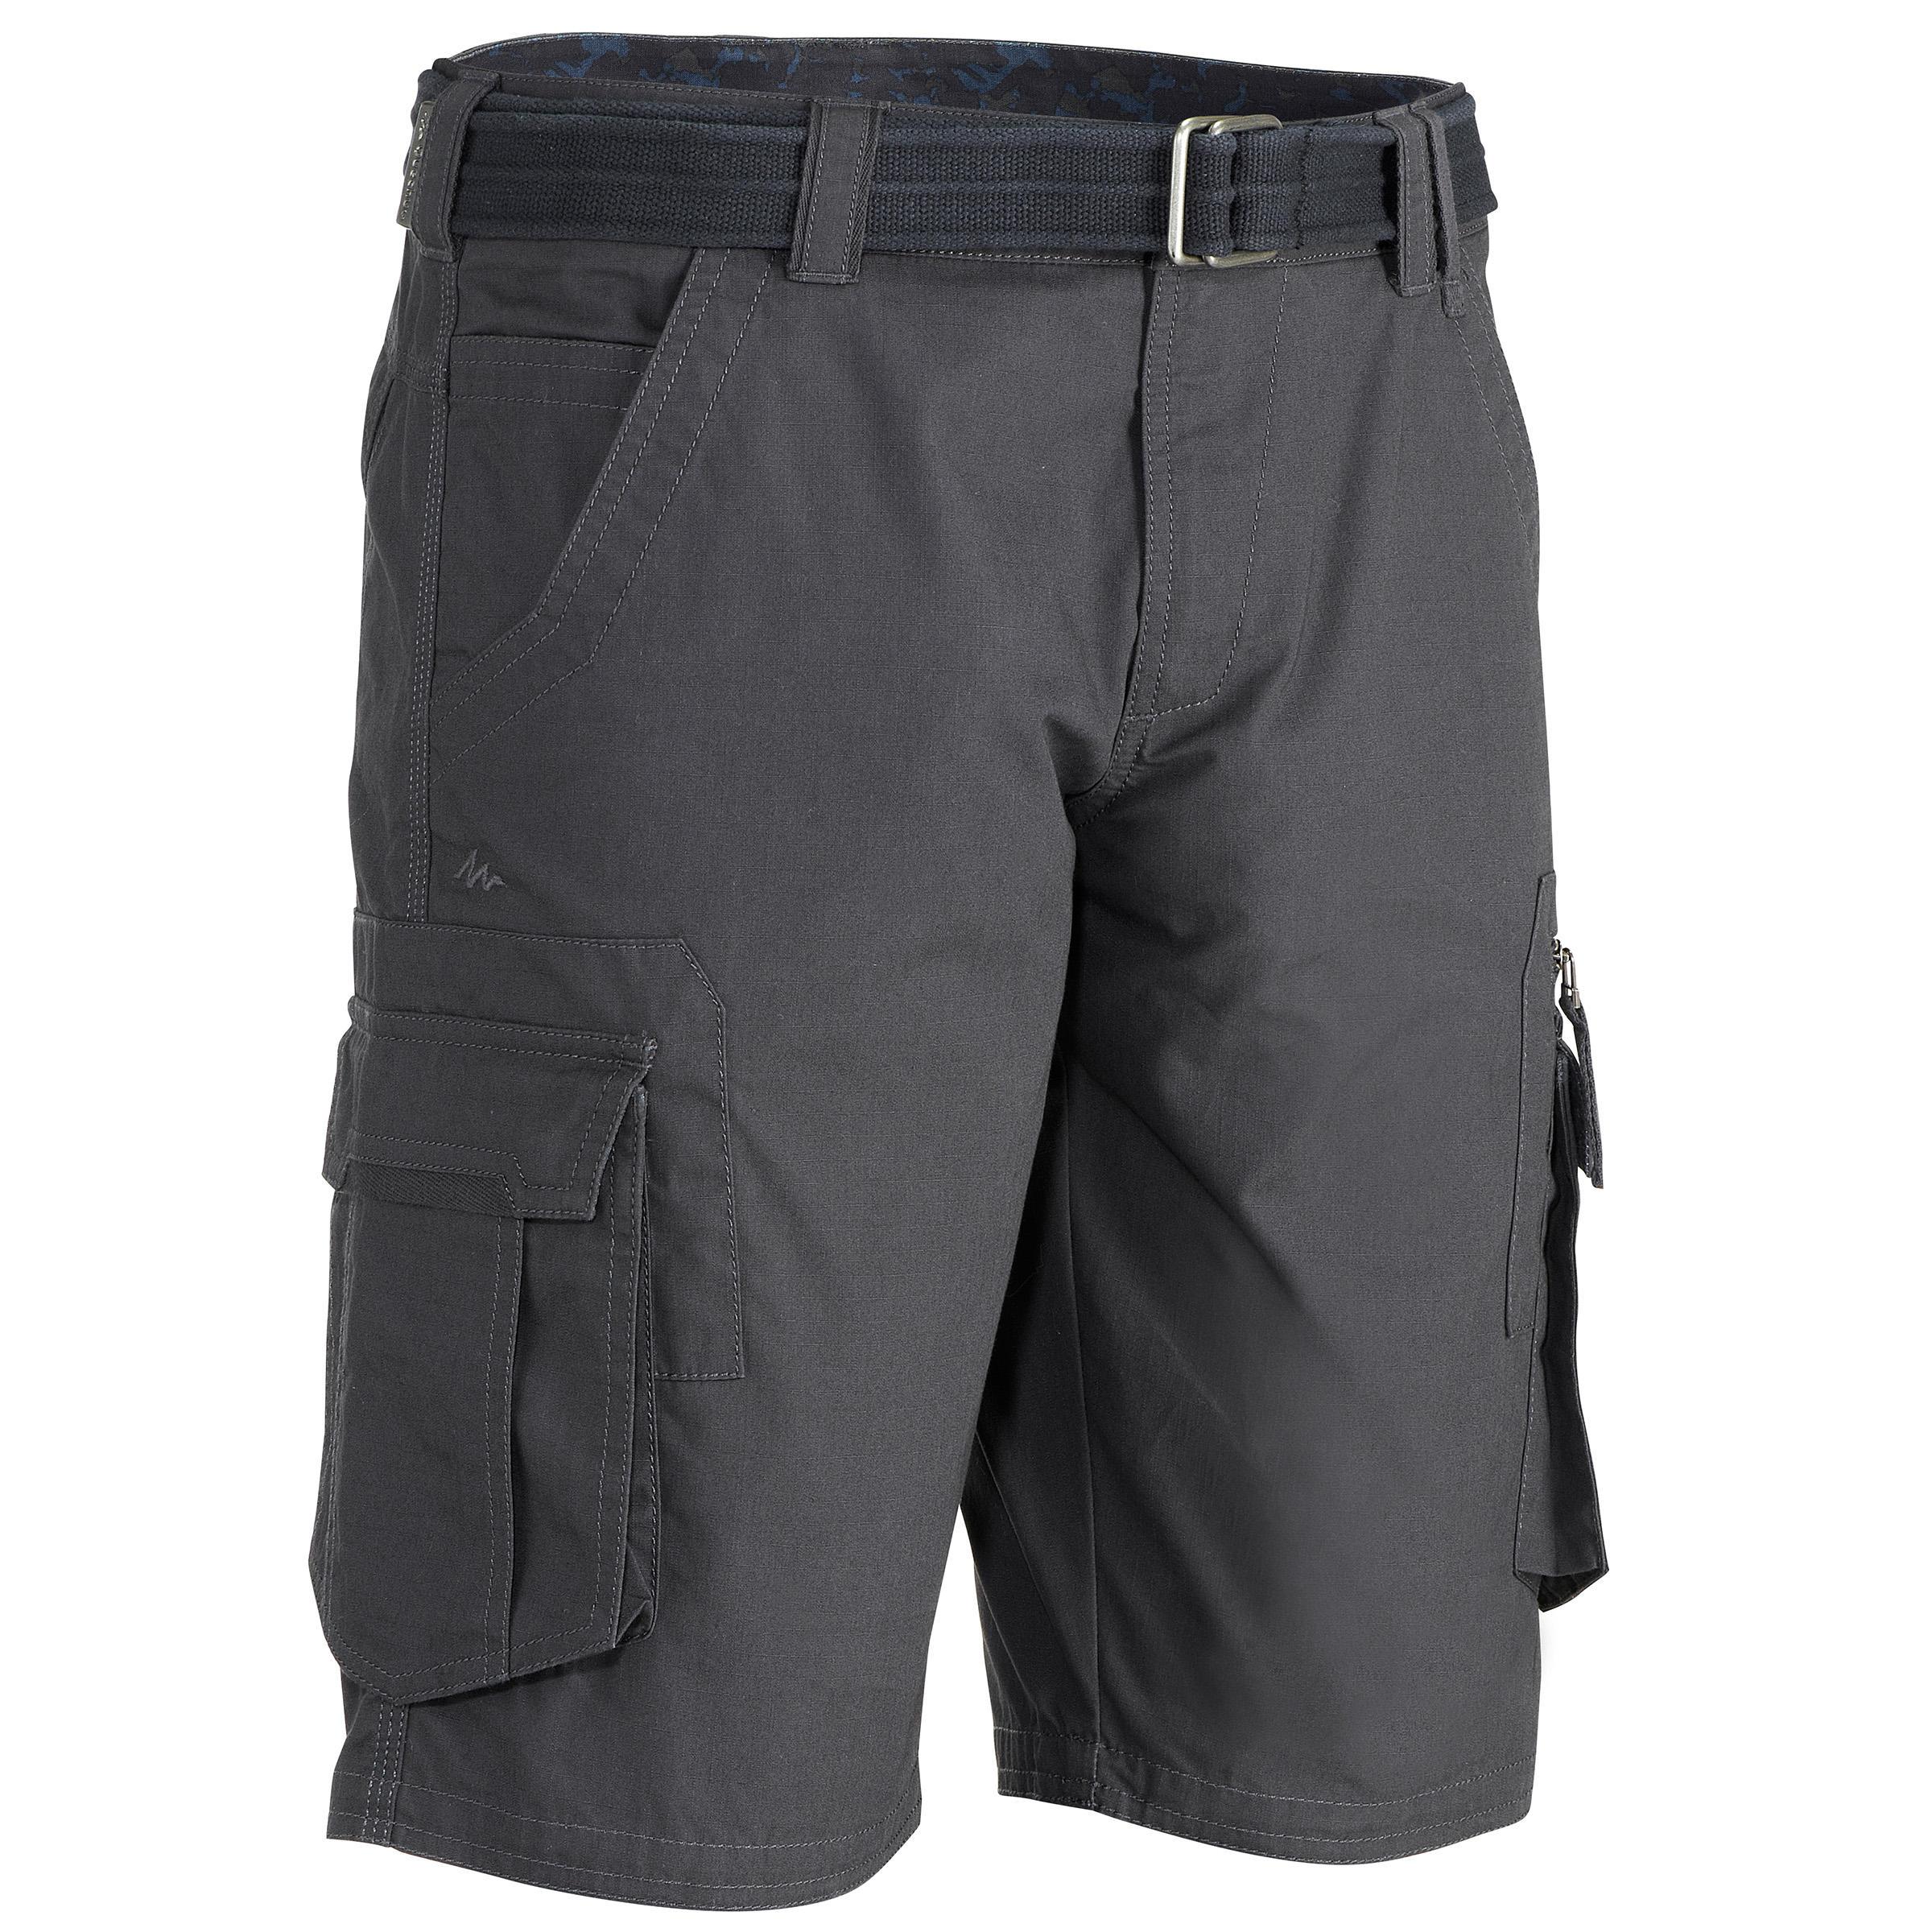 Travel 100 Men's Shorts - Grey